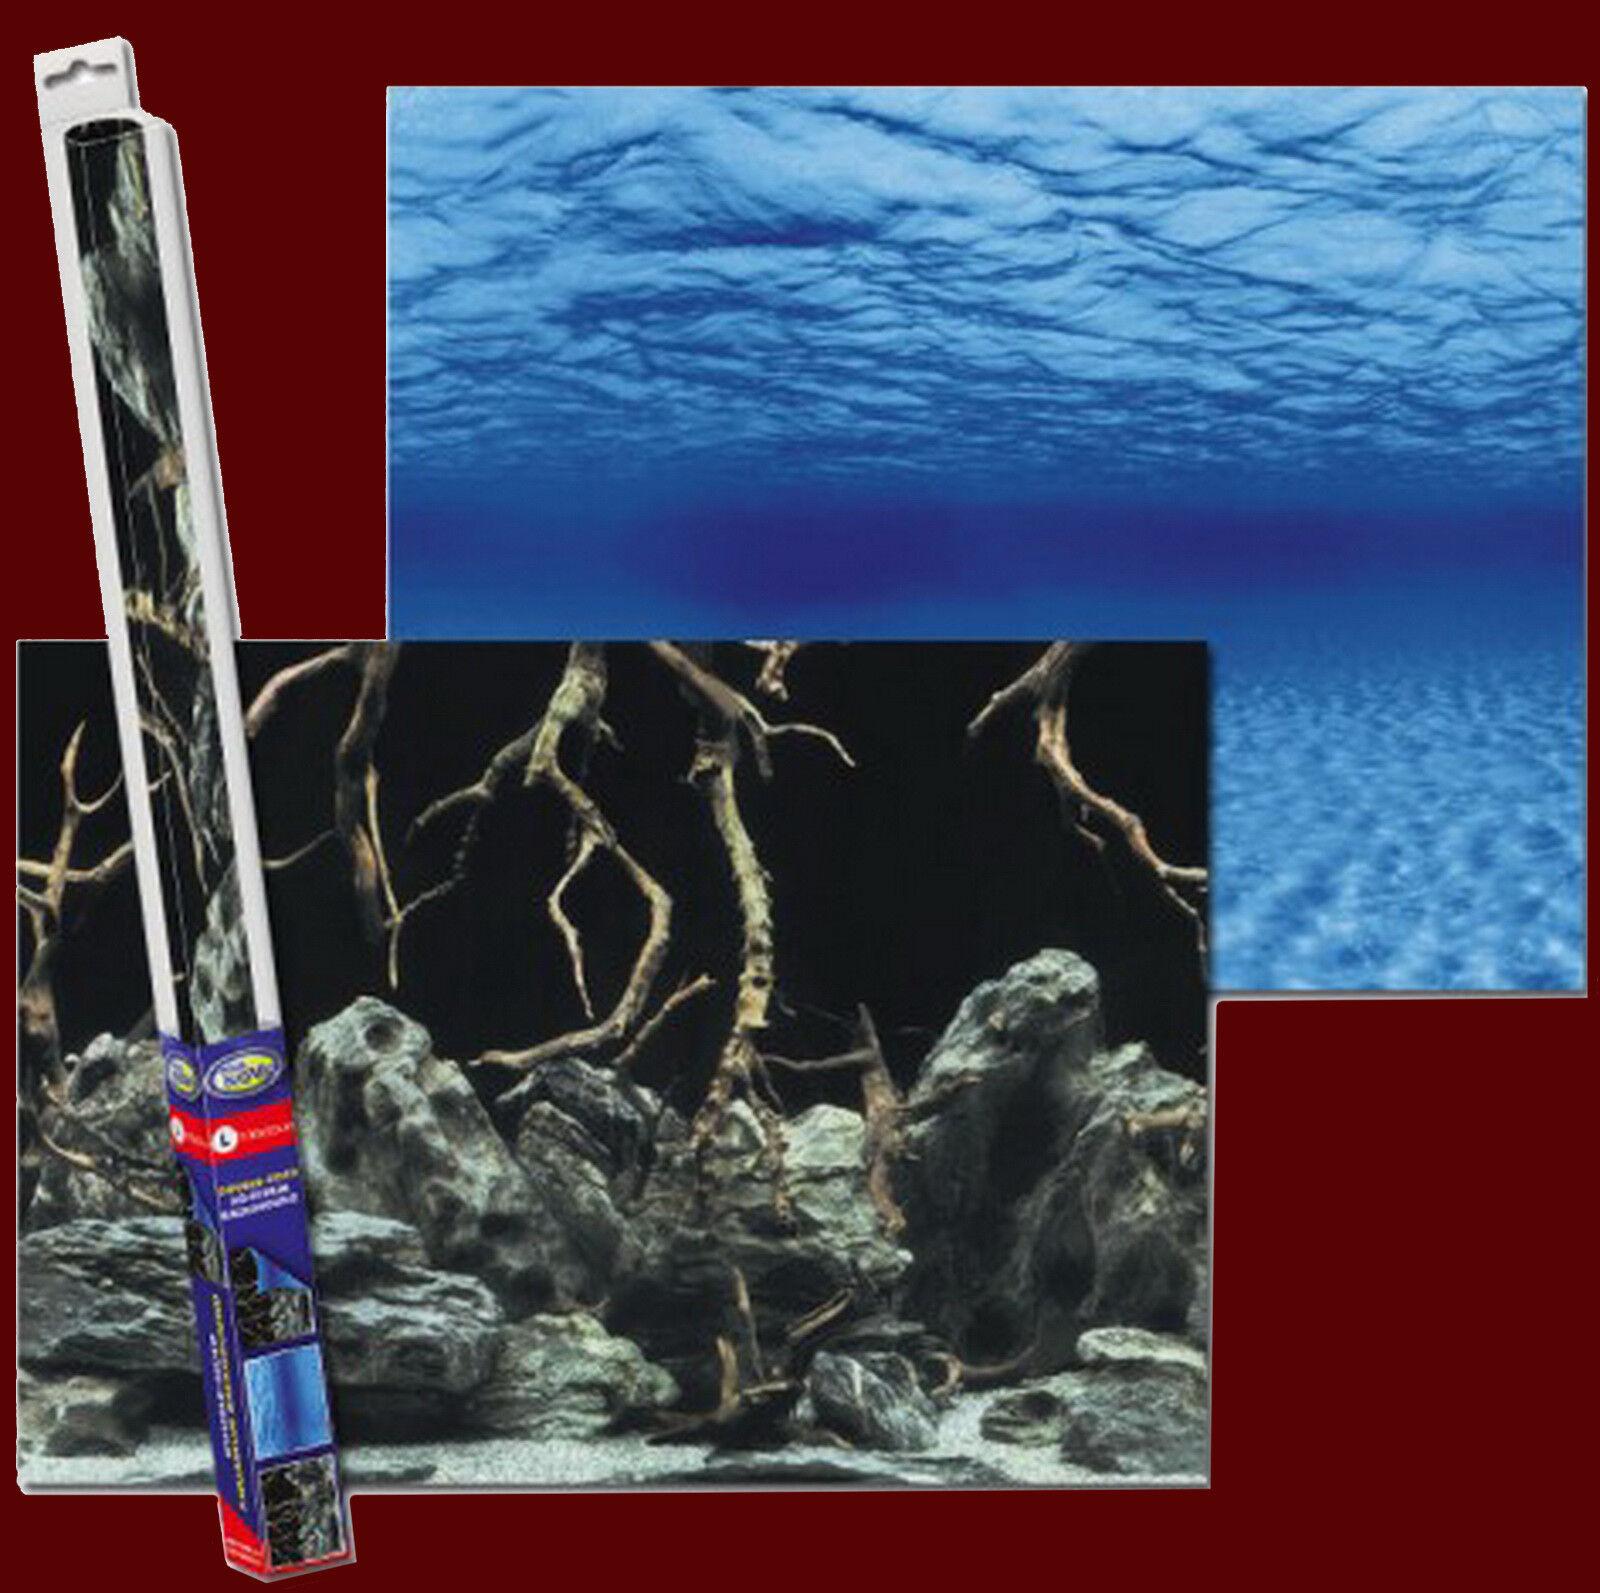 Aquarium Deko ❤️ RÜCKWANDFOLIE 100 X 50cm ❤️ Fotorückwand Zubehör Dekoration